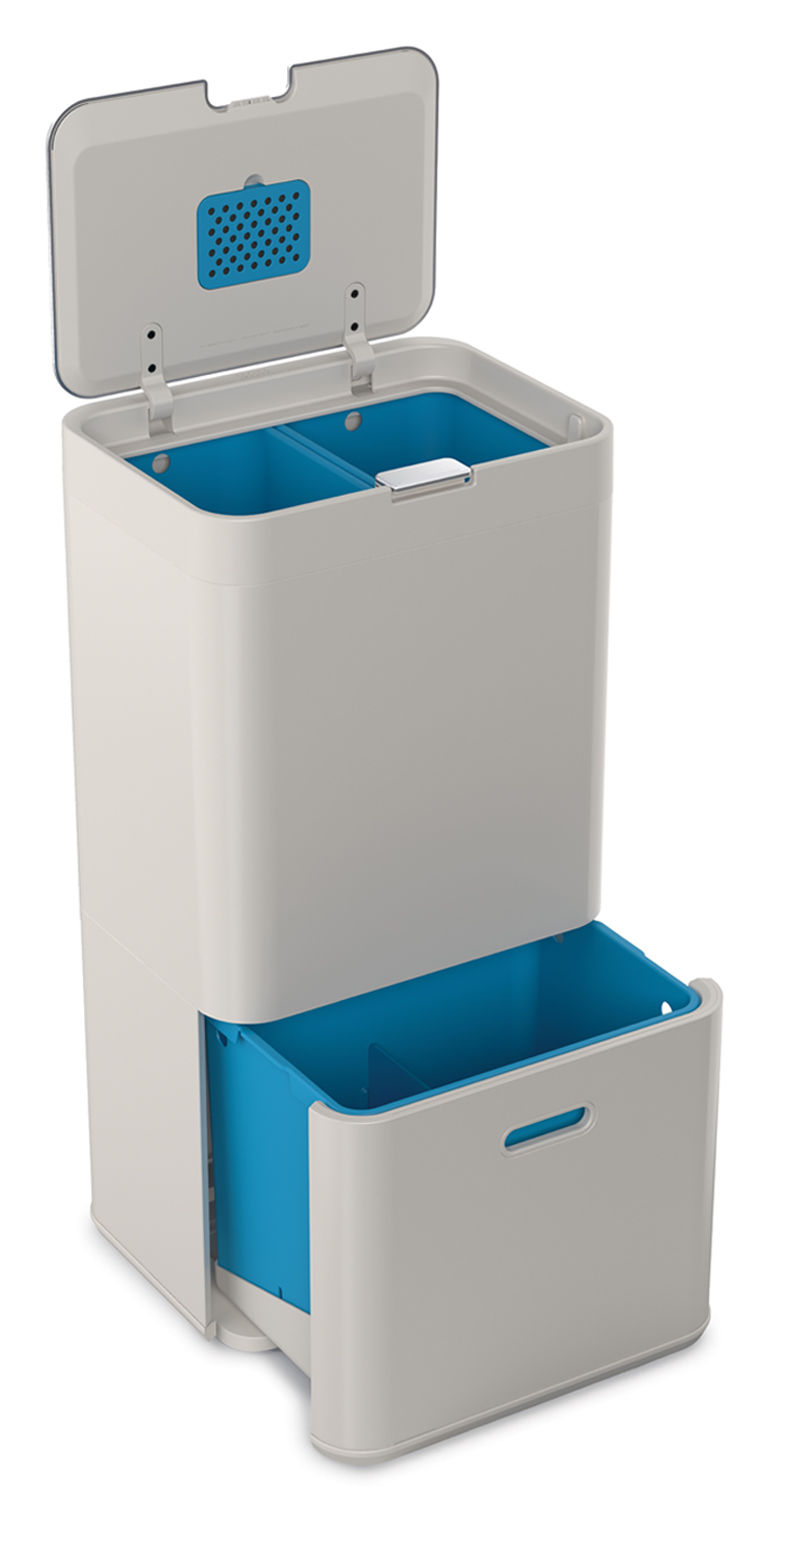 Küche - Mülleimer - Totem 58 Abfallbehälter / 58 l - 4 Fächer - Joseph Joseph - Steingrau - Plastikmaterial, Stahl